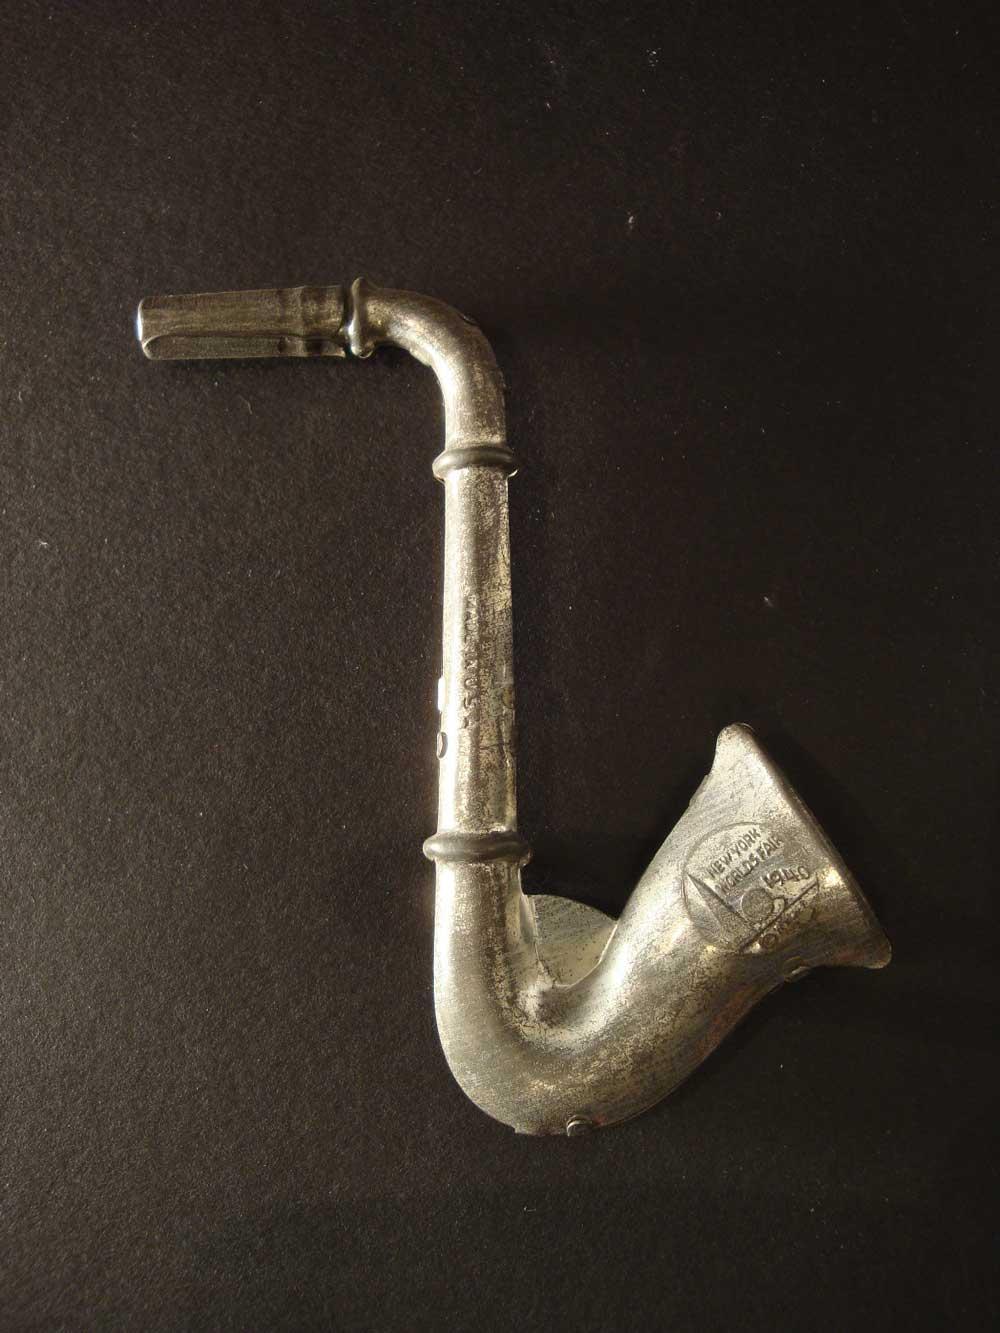 saxophone-shaped, 1940 New York World's Fair, souvenir, collectible, metal